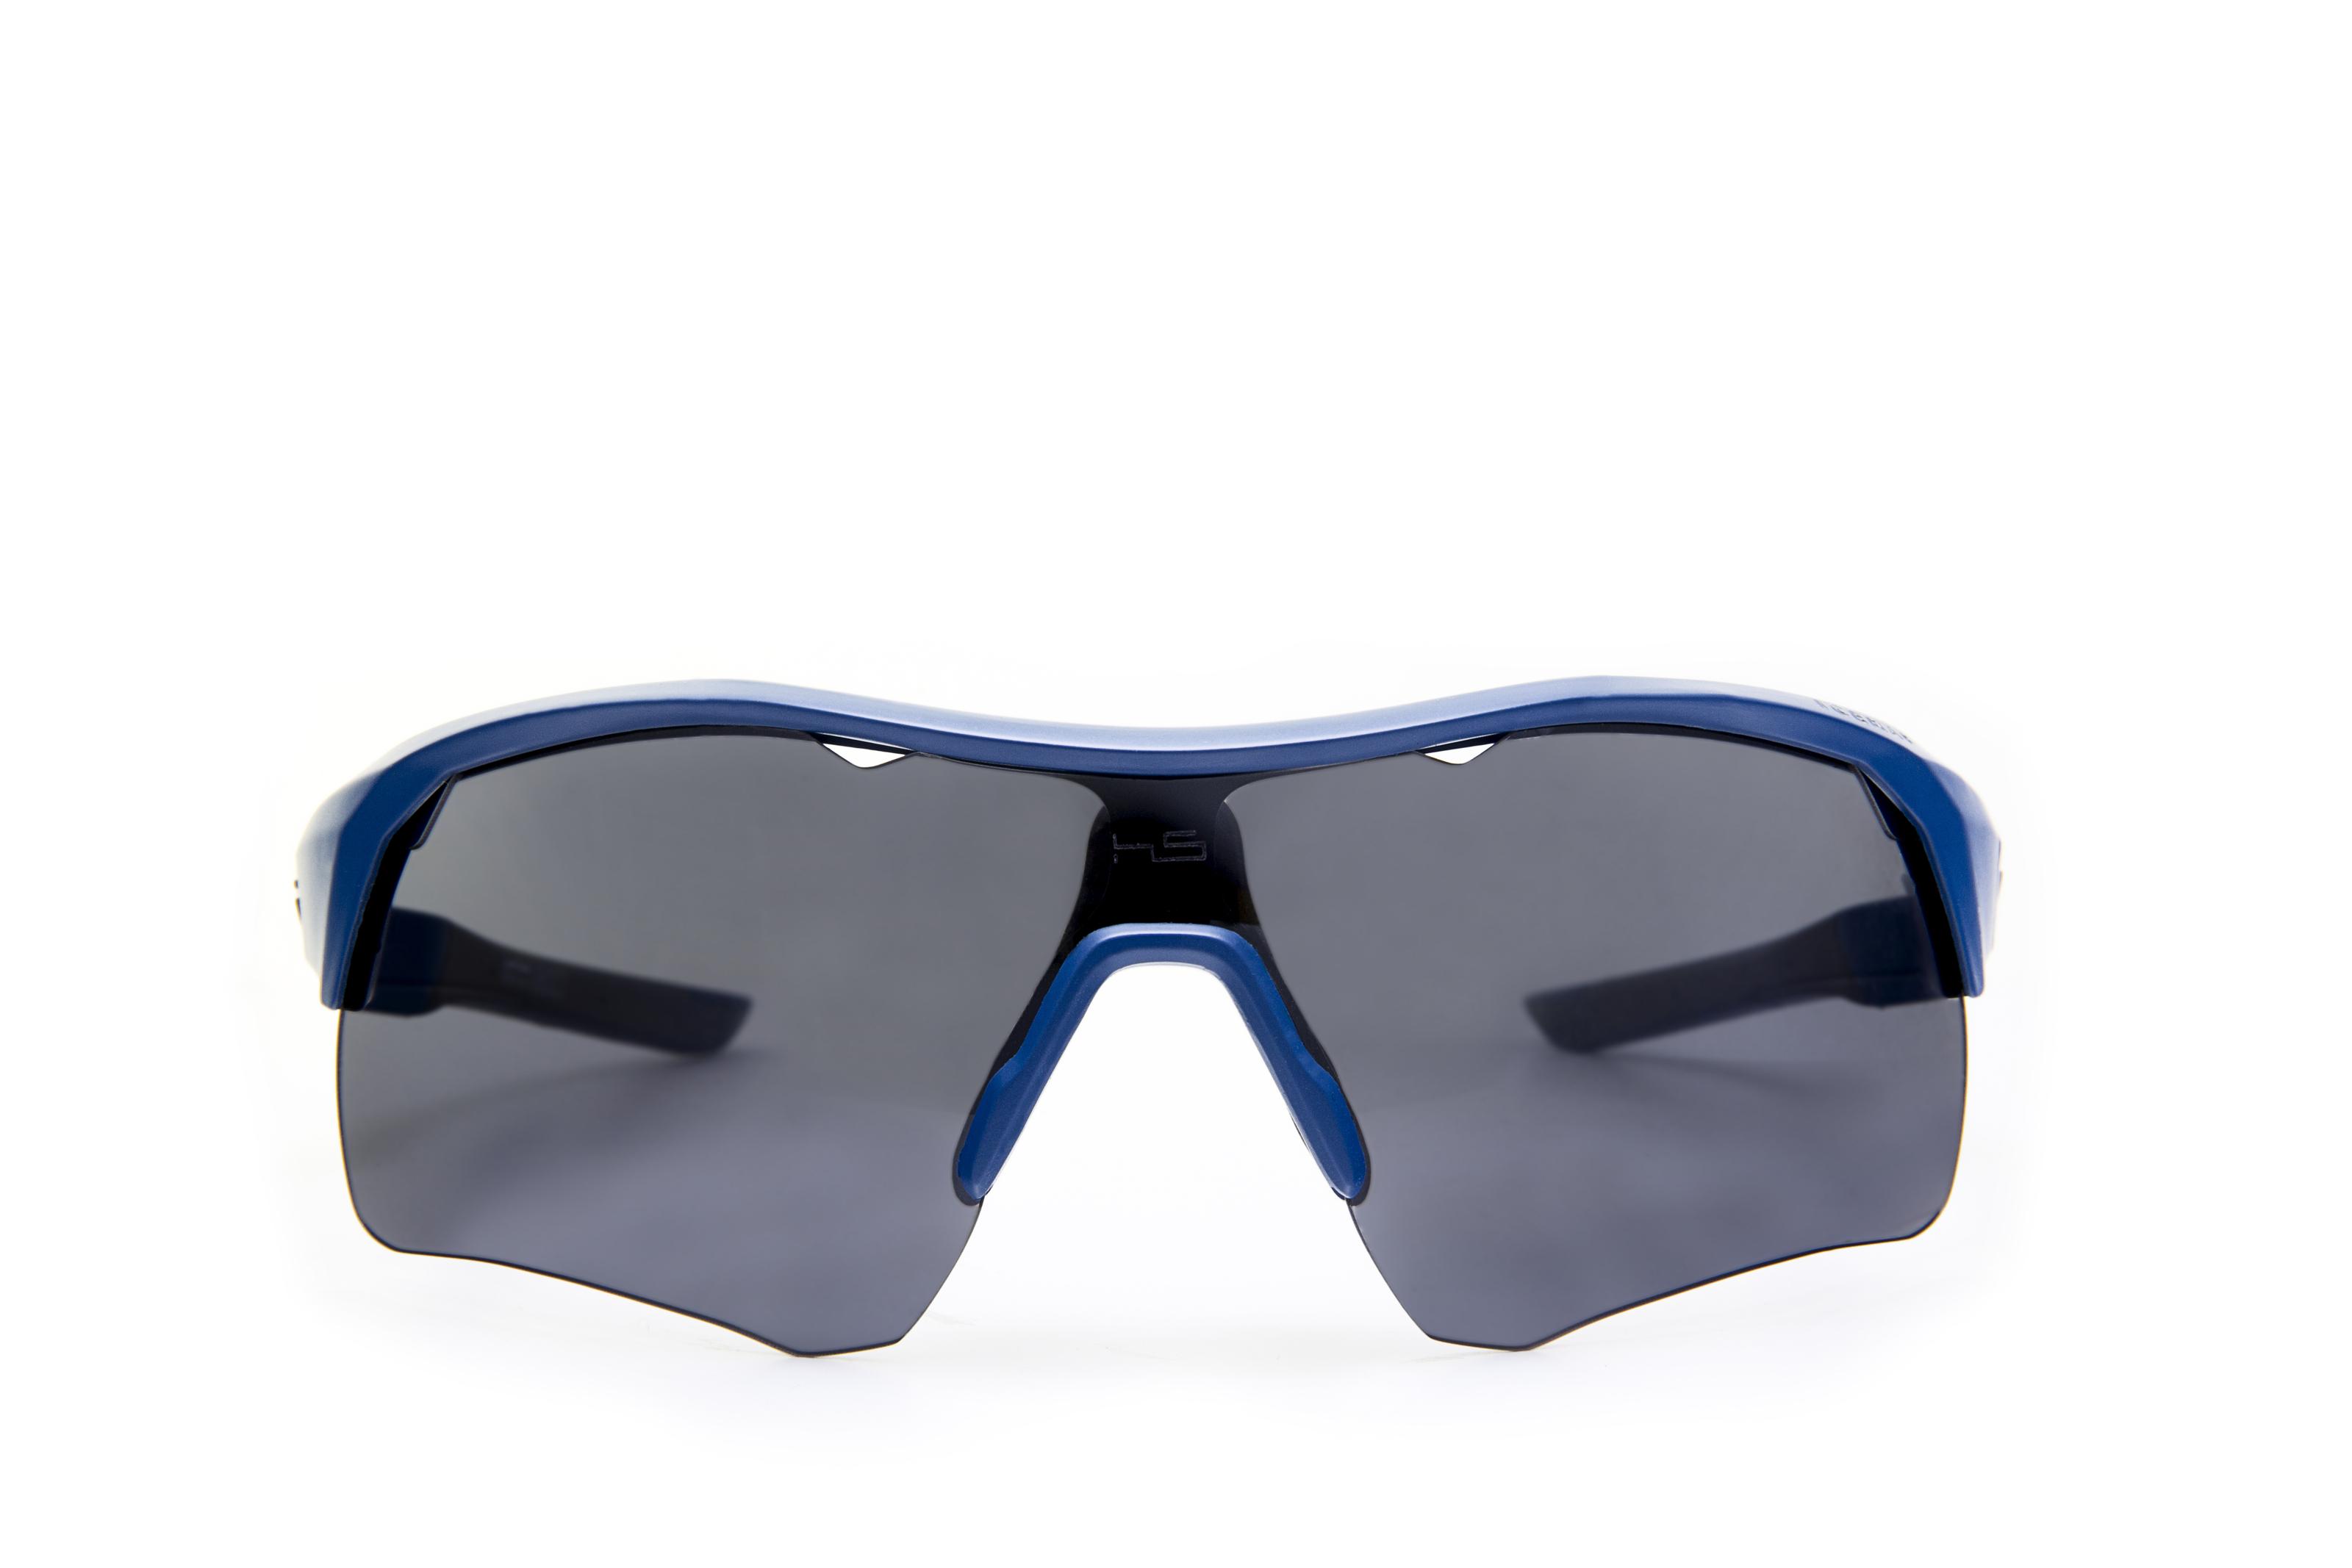 Tävling  Vinn ett par Iceman-glasögon från Henrik Stenson Eyewear ... 639ac0930c53b